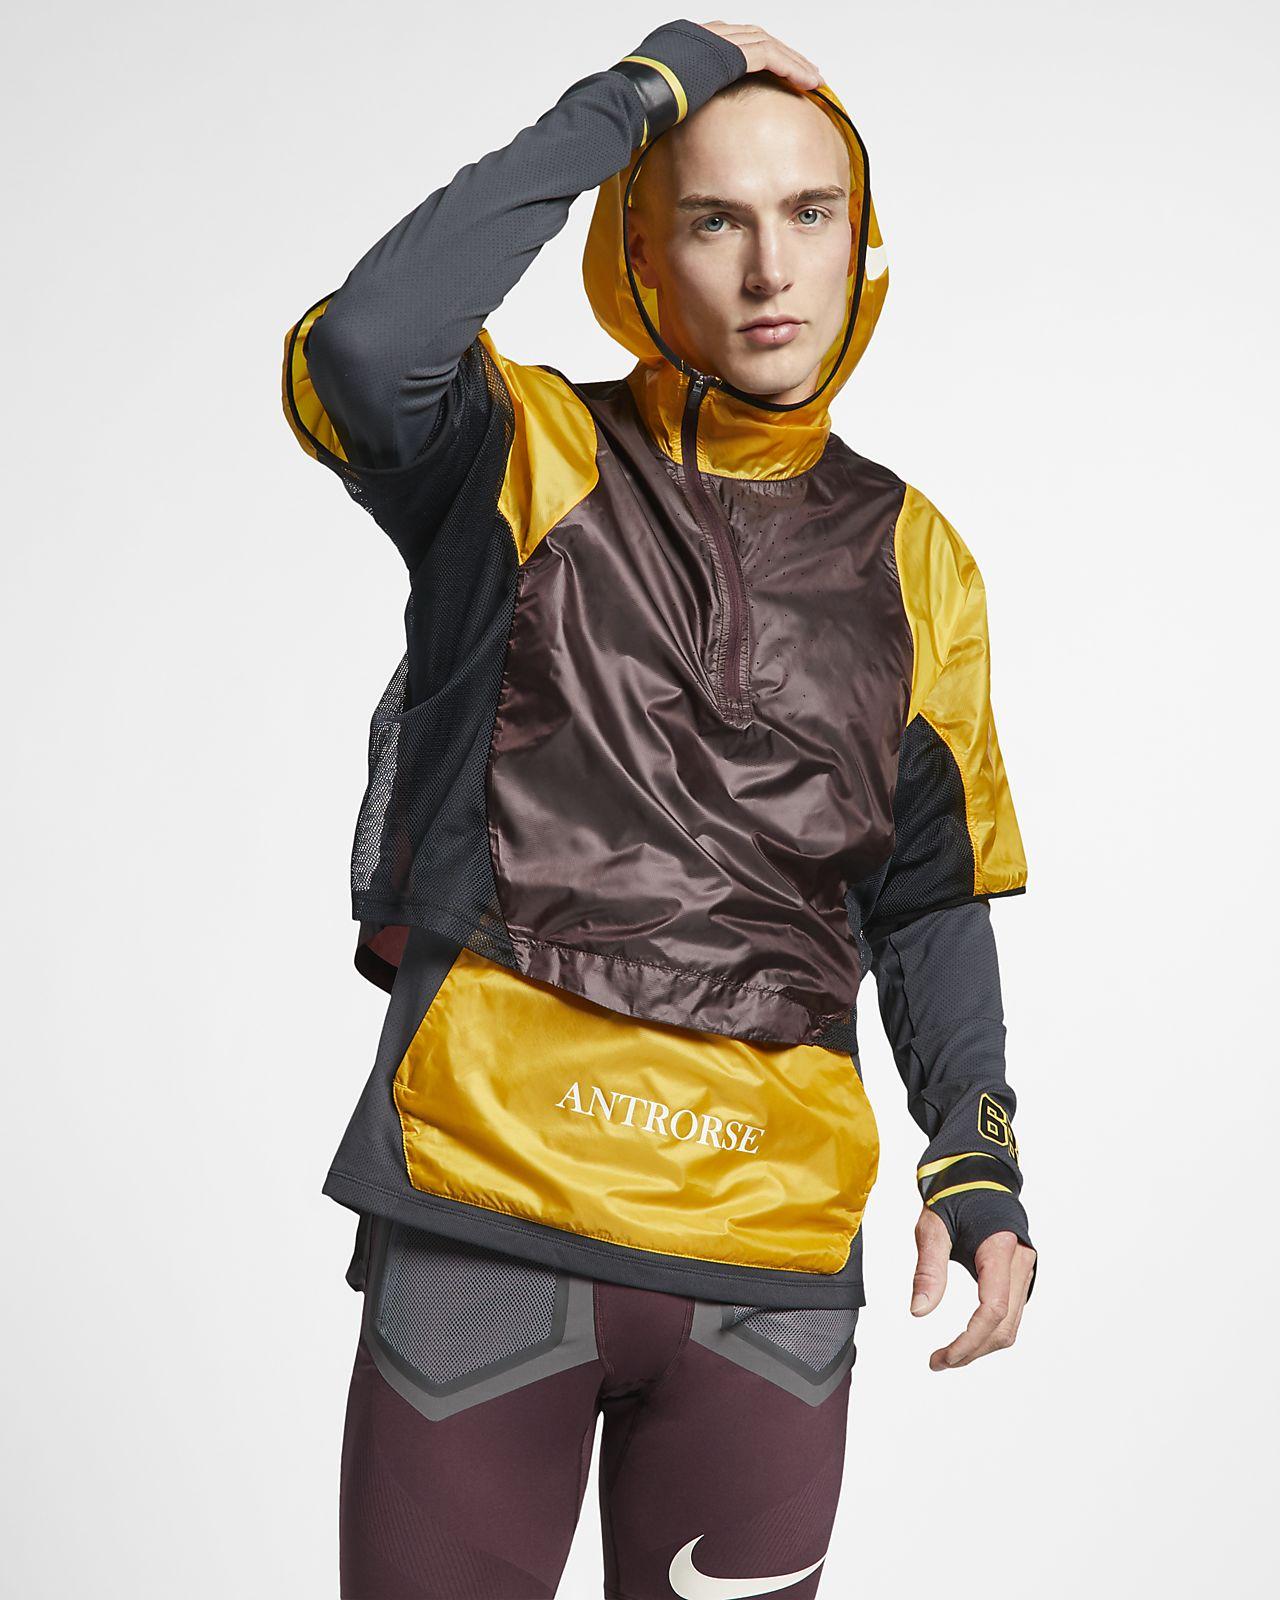 Jacka Nike Gyakusou Transform för män